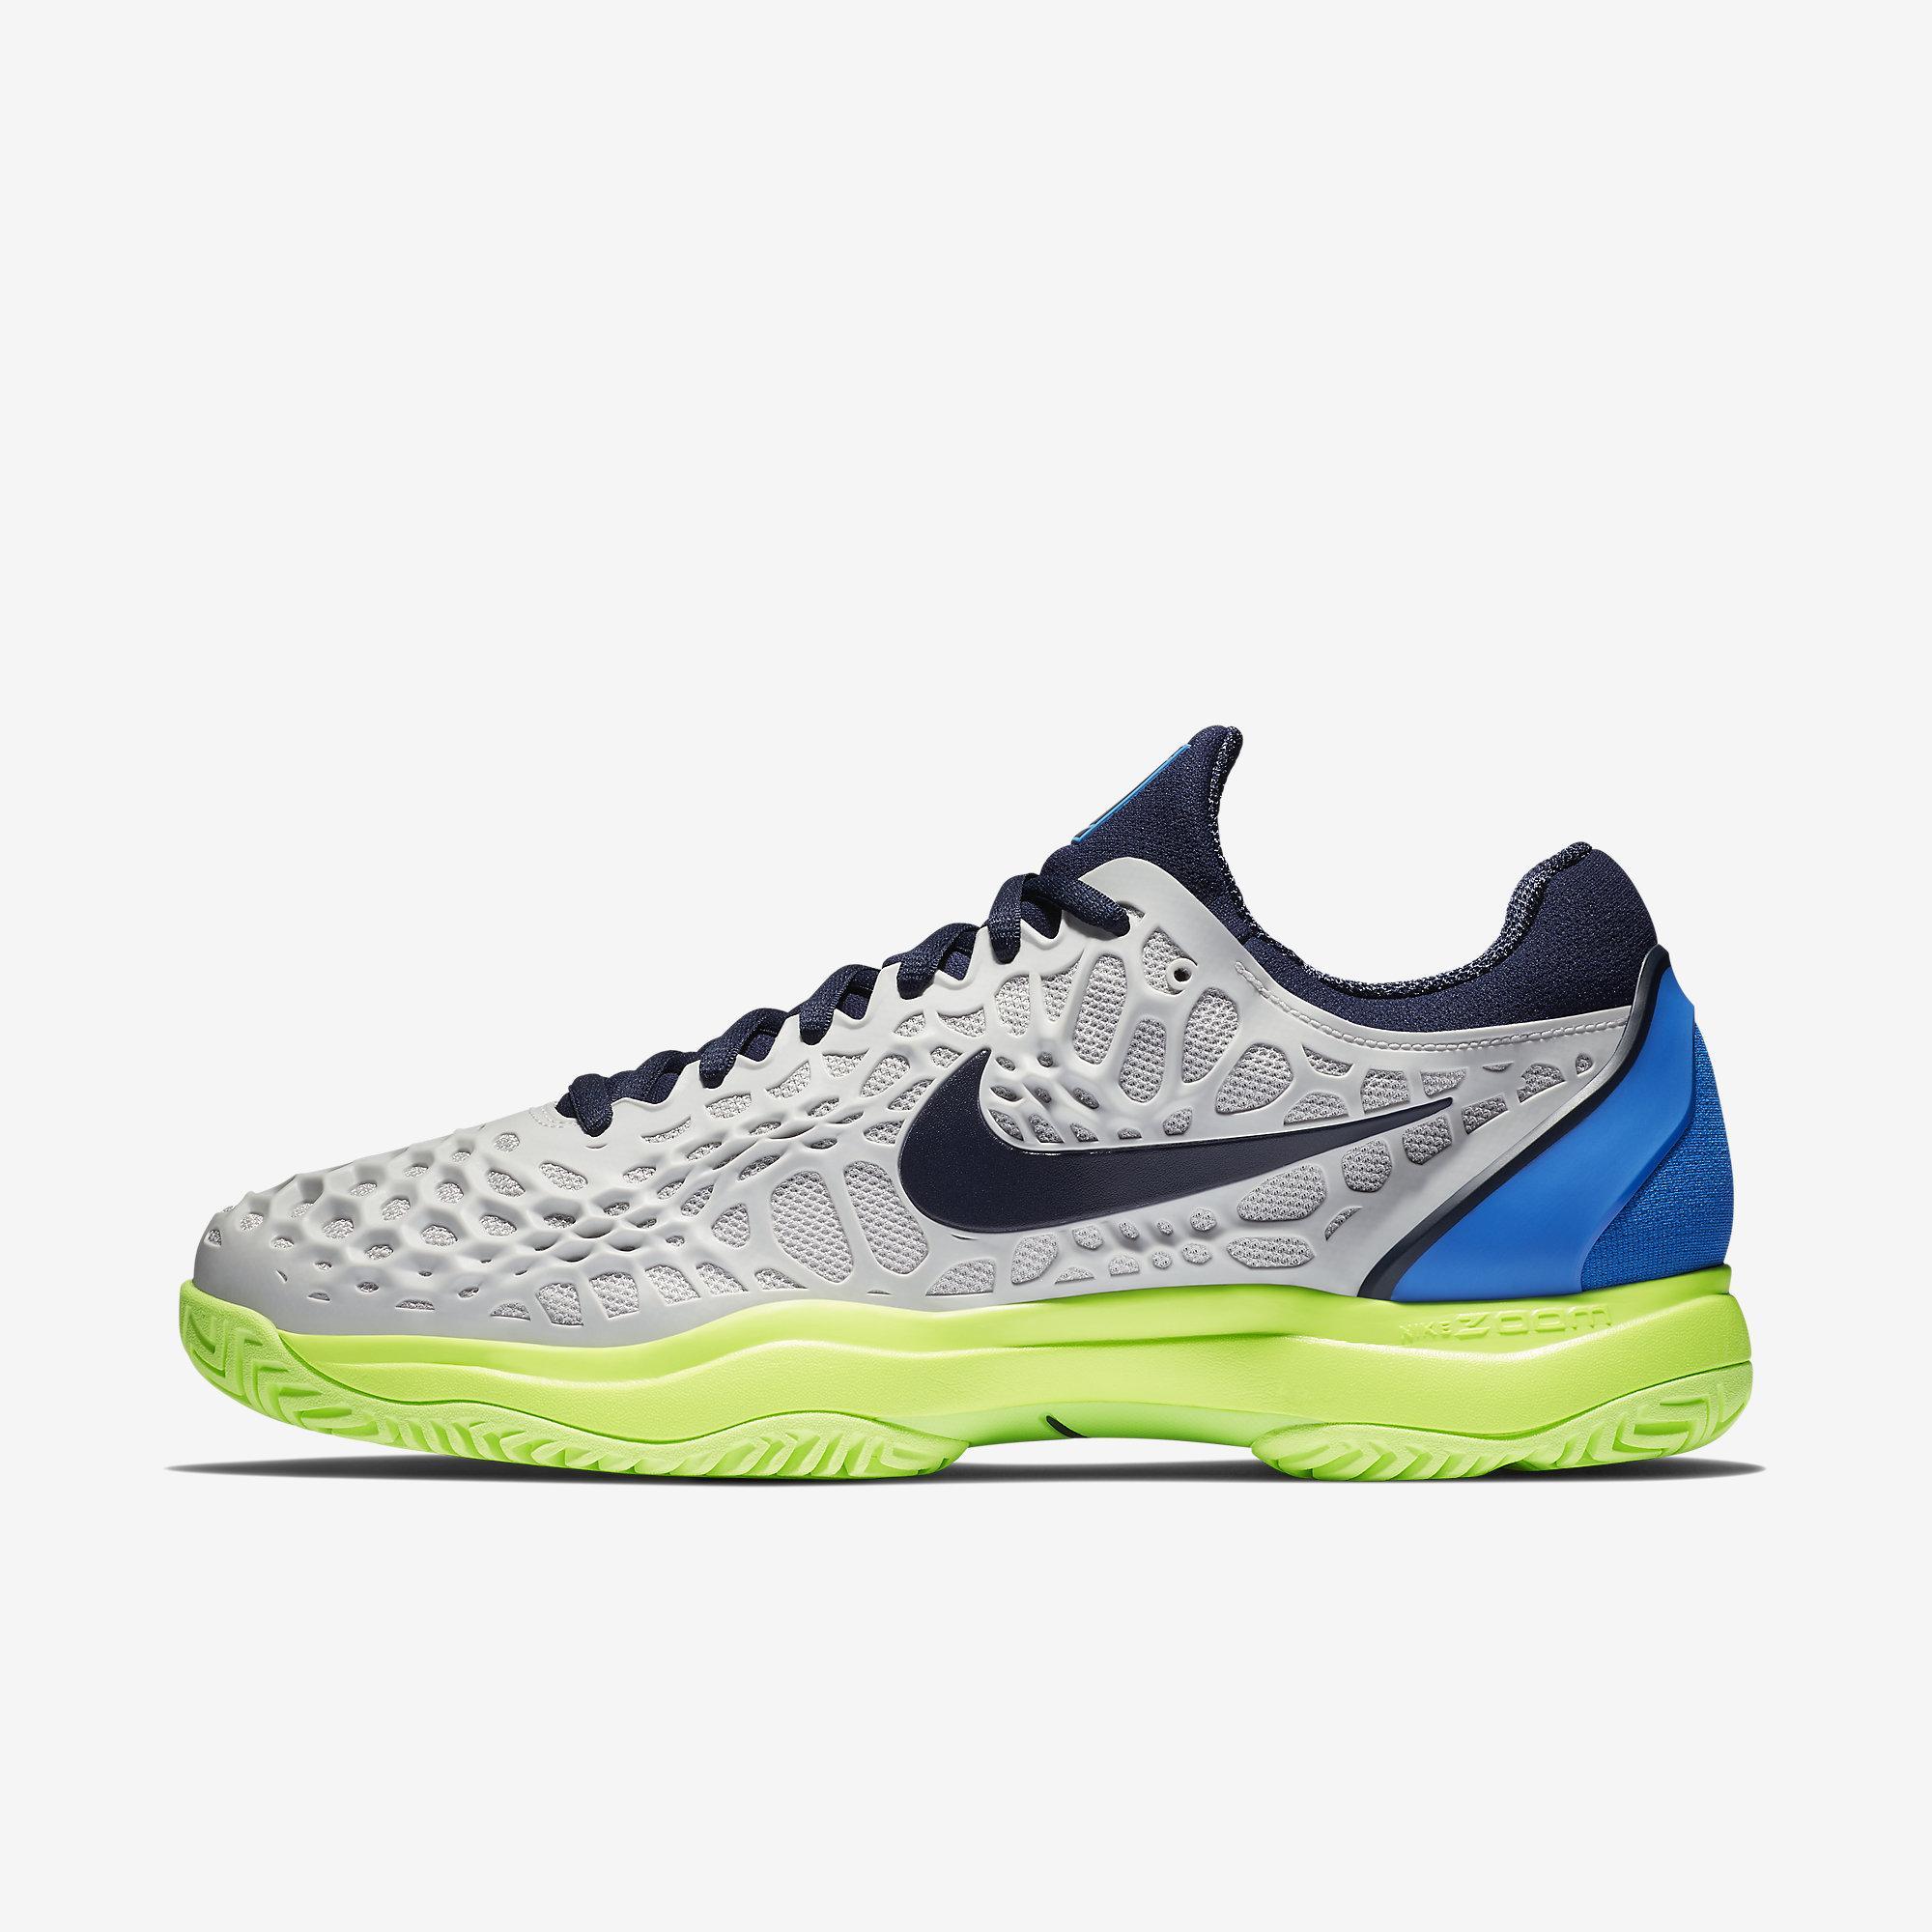 best website 8aeb6 0d3a9 Nike Mens Zoom Cage 3 Tennis Shoes - Vast Grey Signal Blue Volt  Glow Blackened Blue - Tennisnuts.com